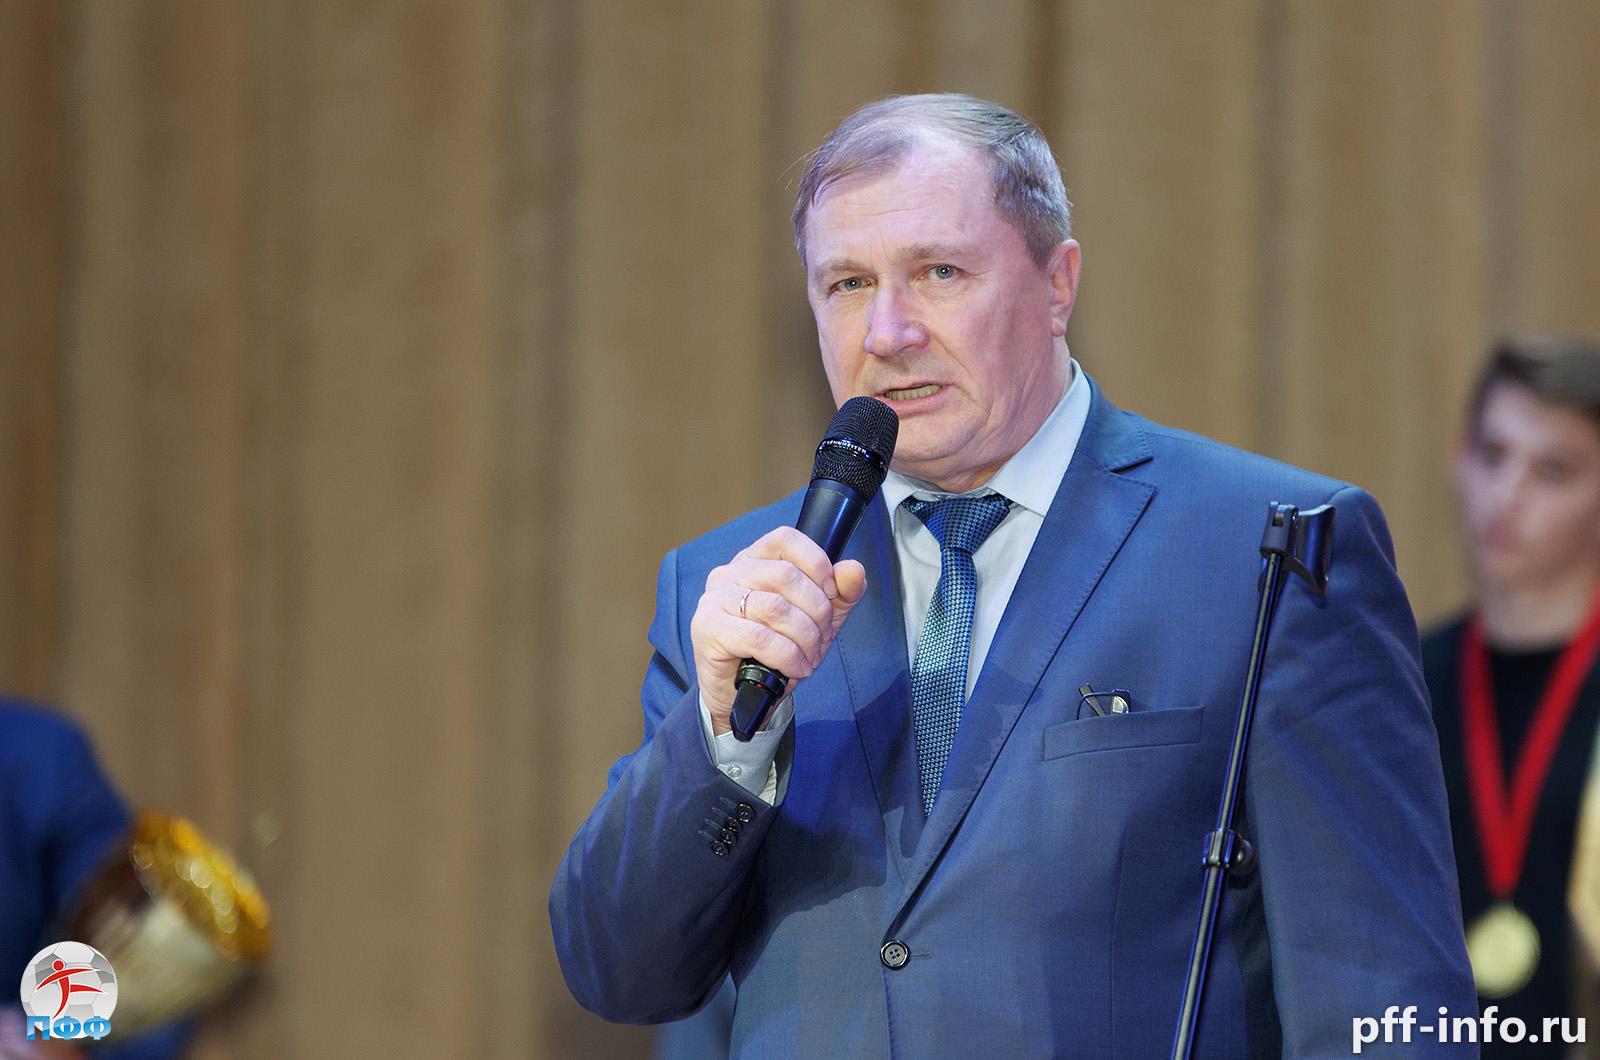 С Юбилеем, Михаил Михайлович!